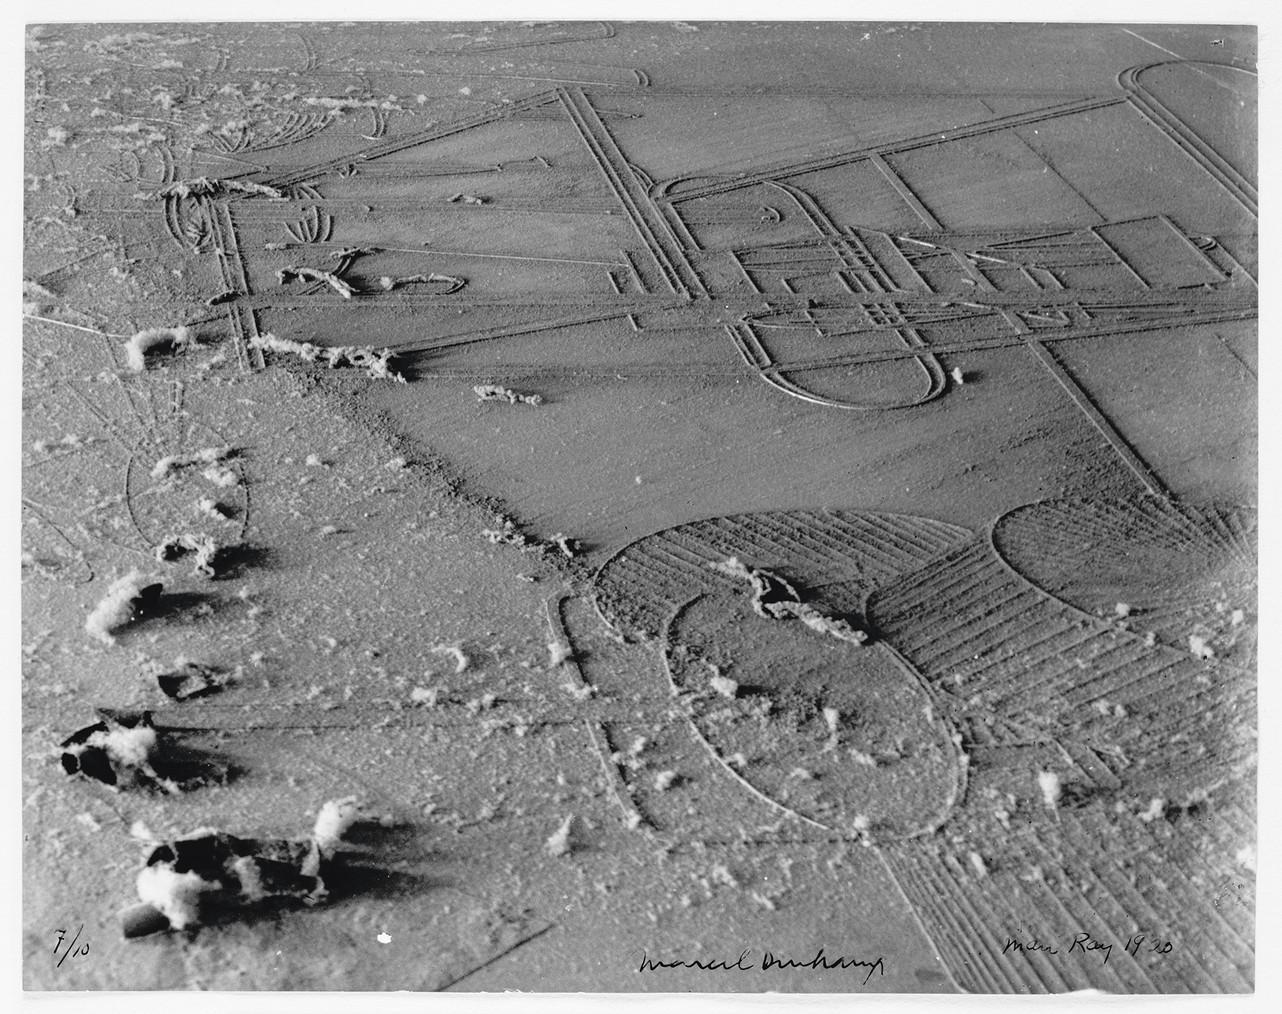 Man Ray / Marcel Duchamp, Dust Breeding, 1920 (printed 1964). Courtesy Galerie Françoise Paviot, Paris.